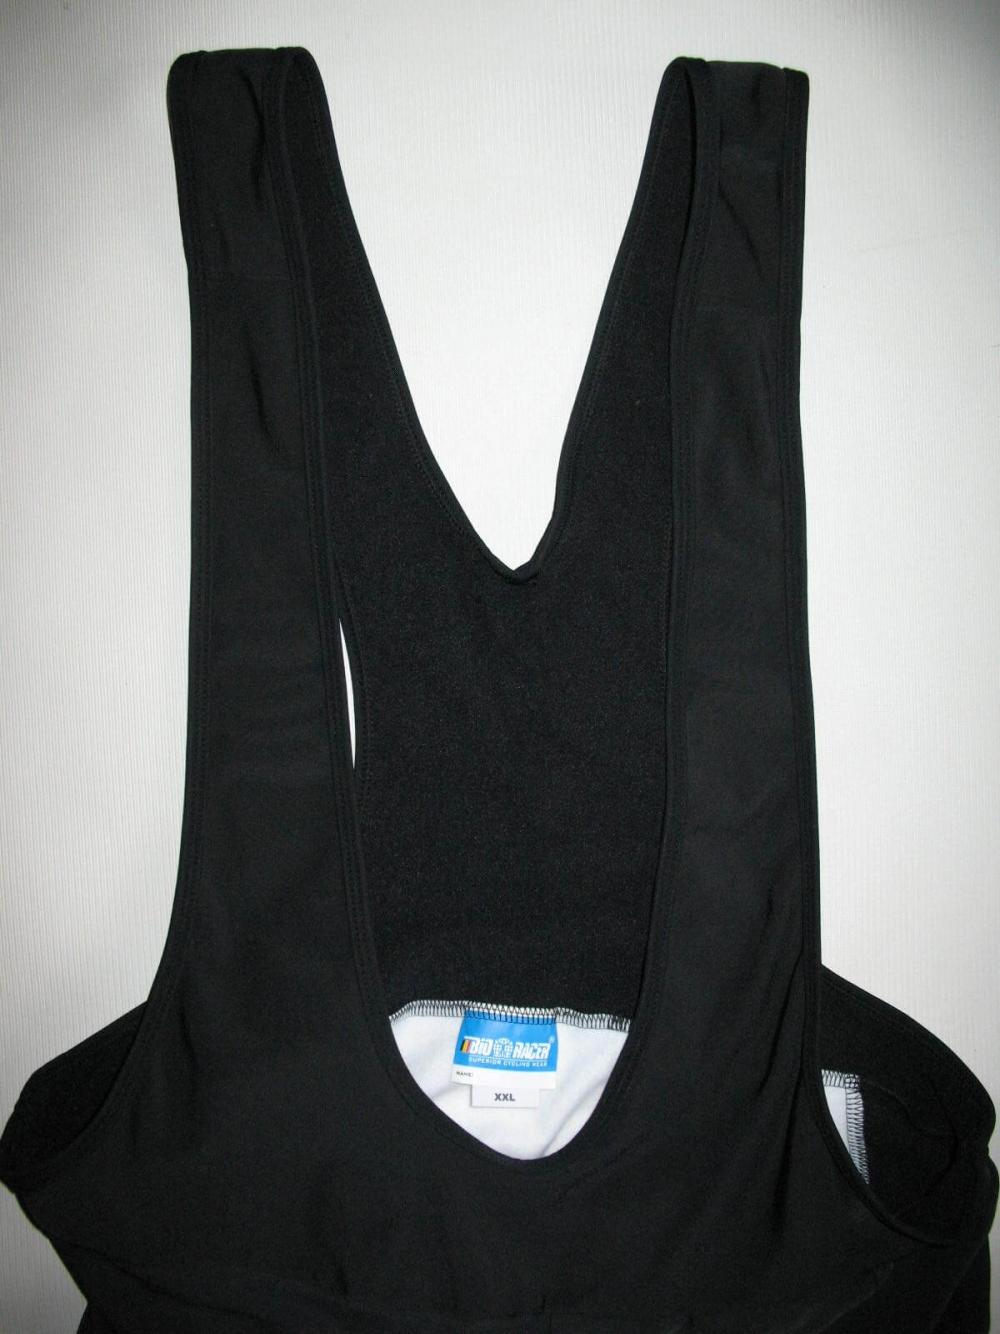 Брюки BIORACER bergamont bib pants (размер XXL/XL) - 3